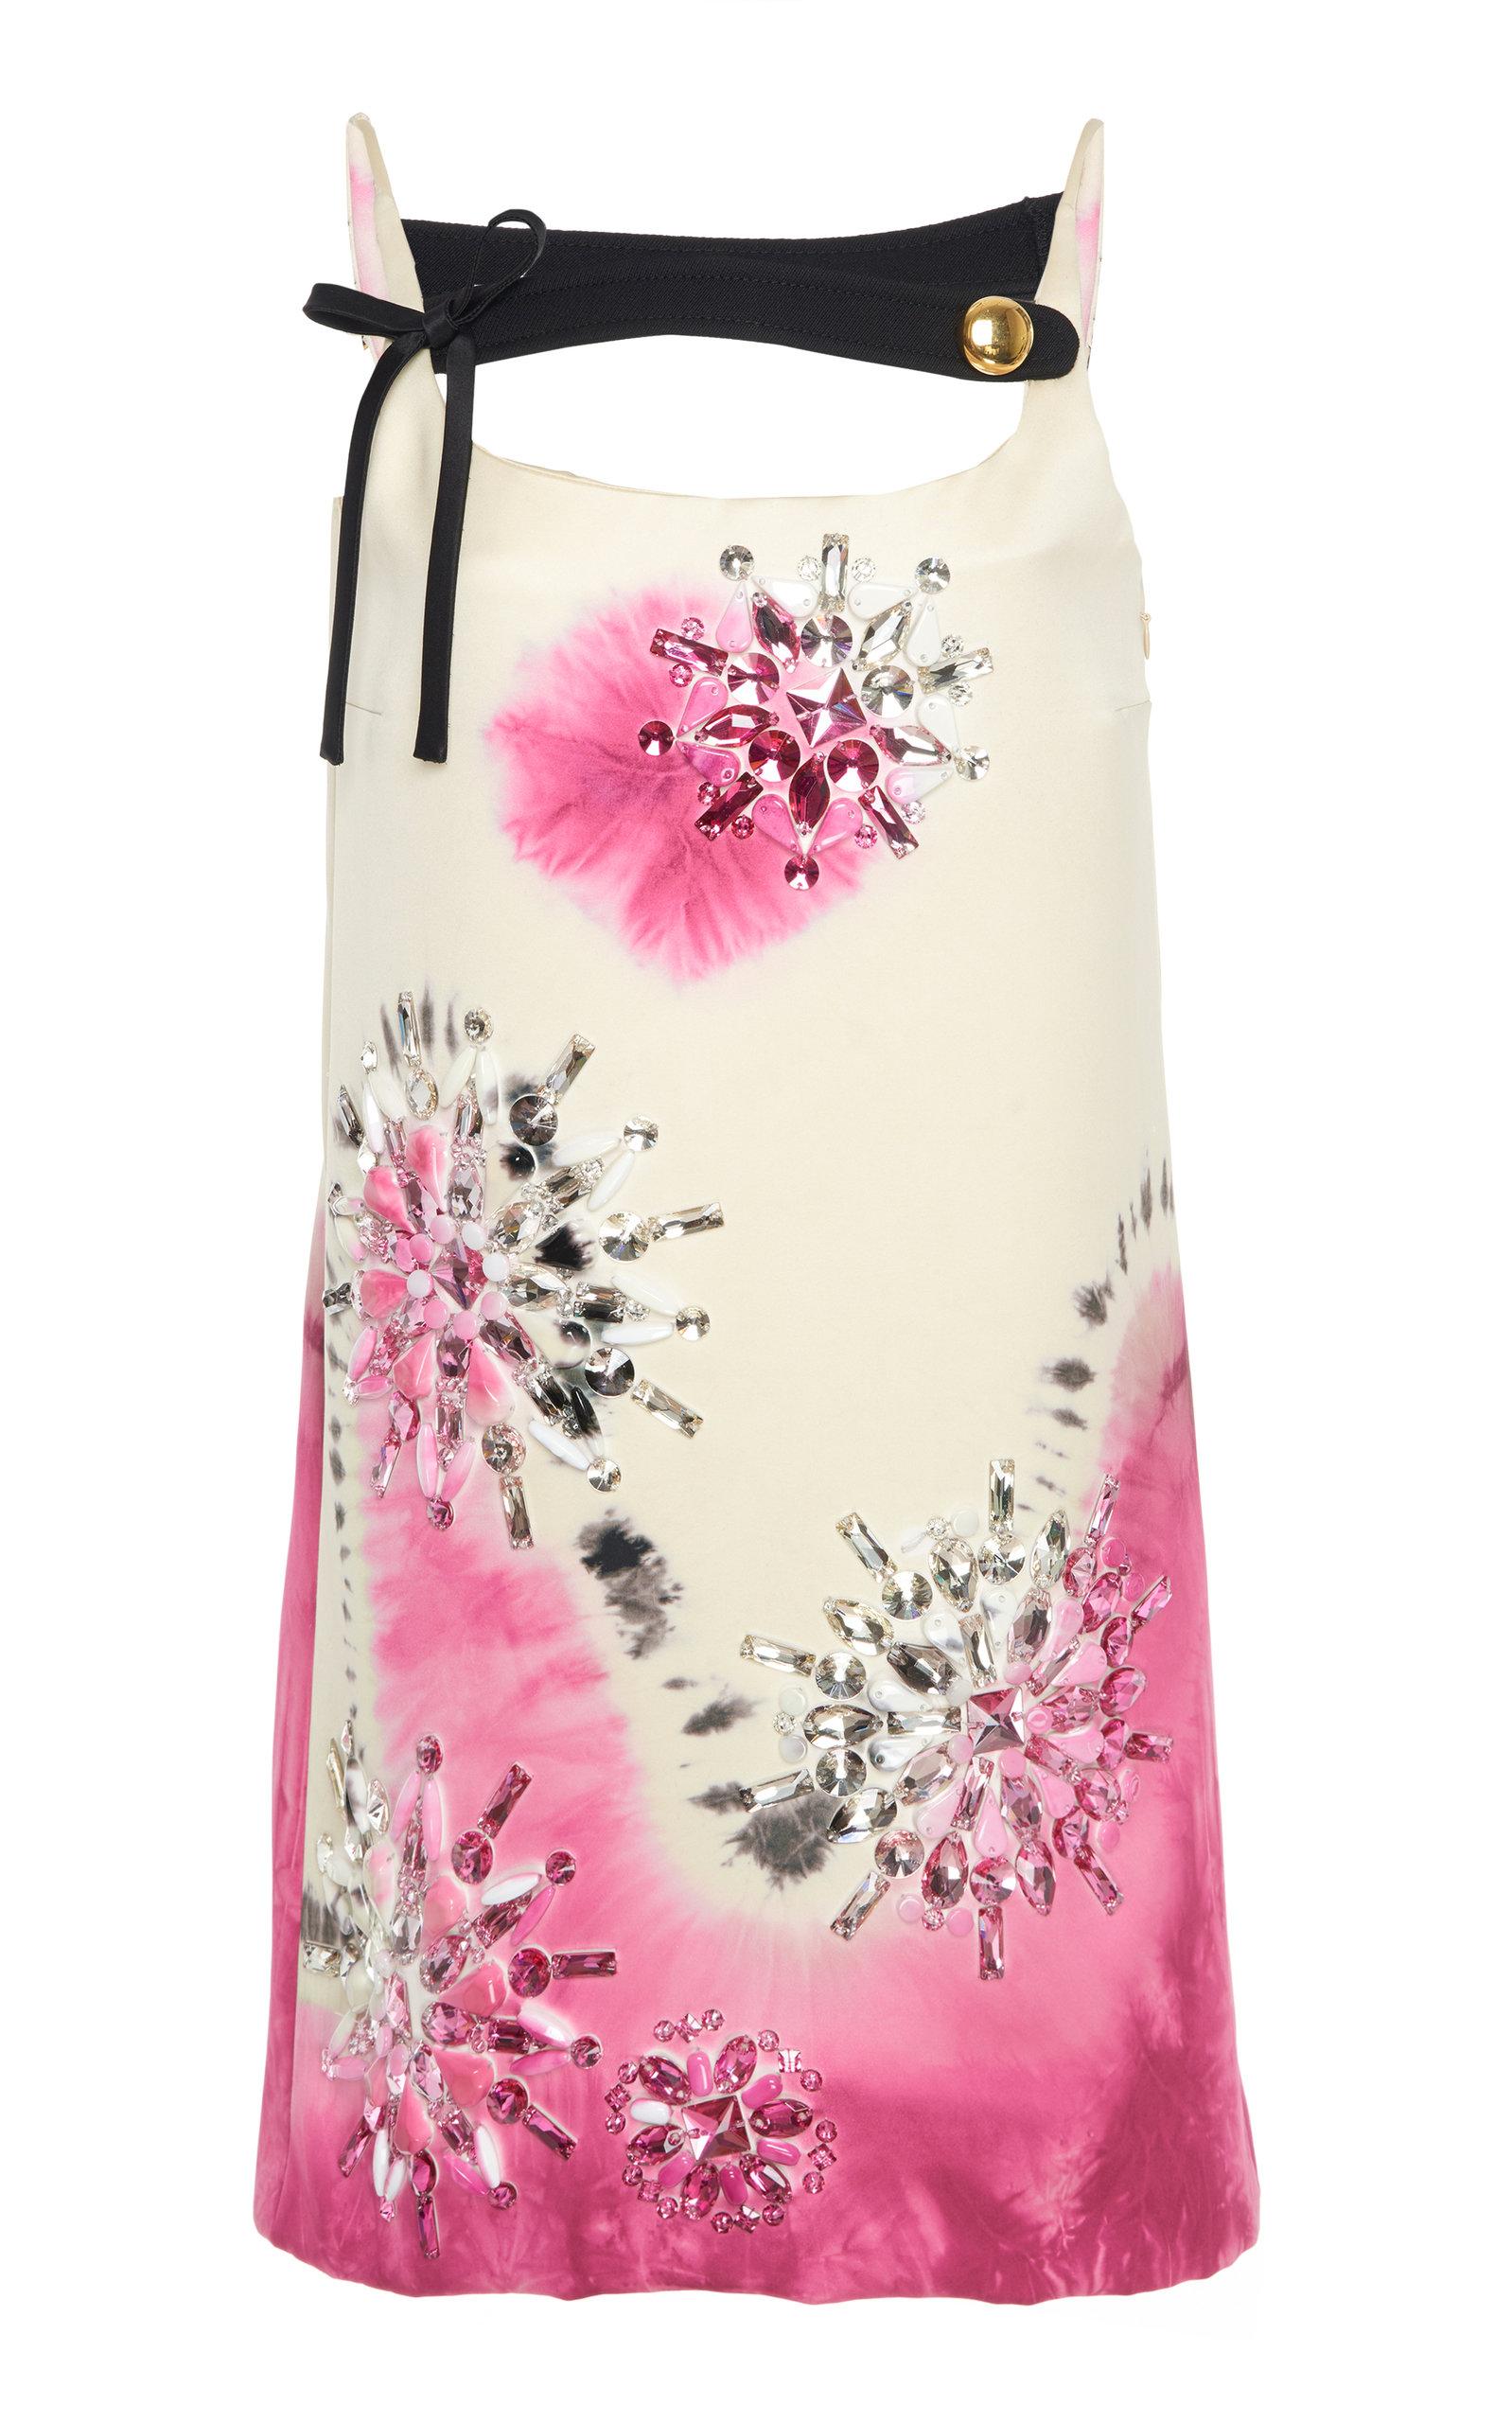 Buy Prada Embellished Tie-Dye Silk-Satin Mini Dress online, shop Prada at the best price